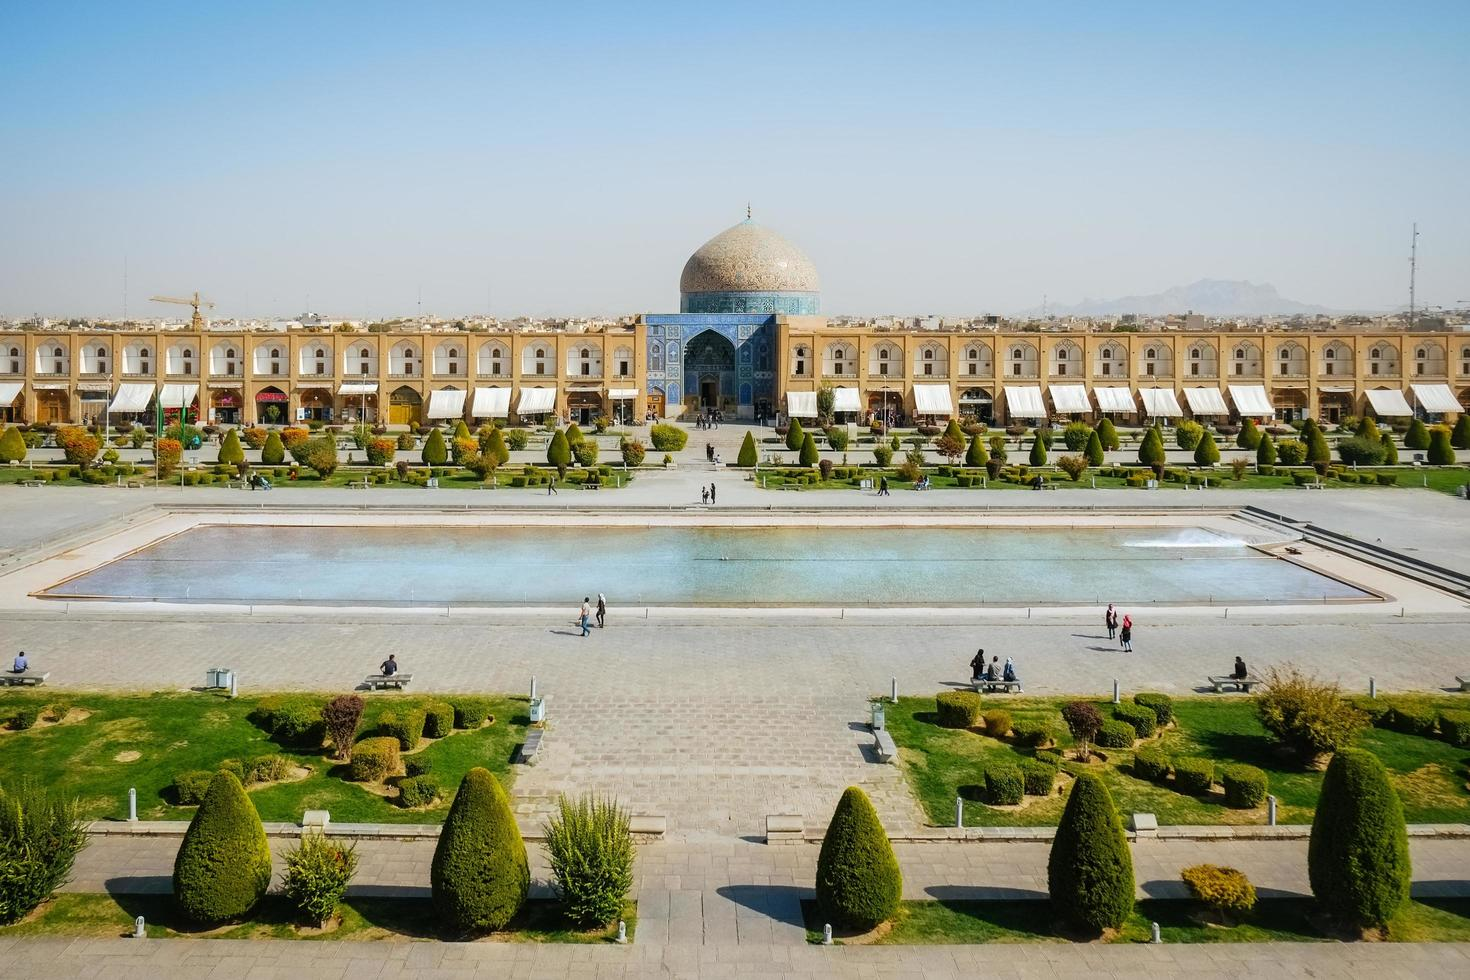 naqsh-e jahan-plein in isfahan, iran. foto